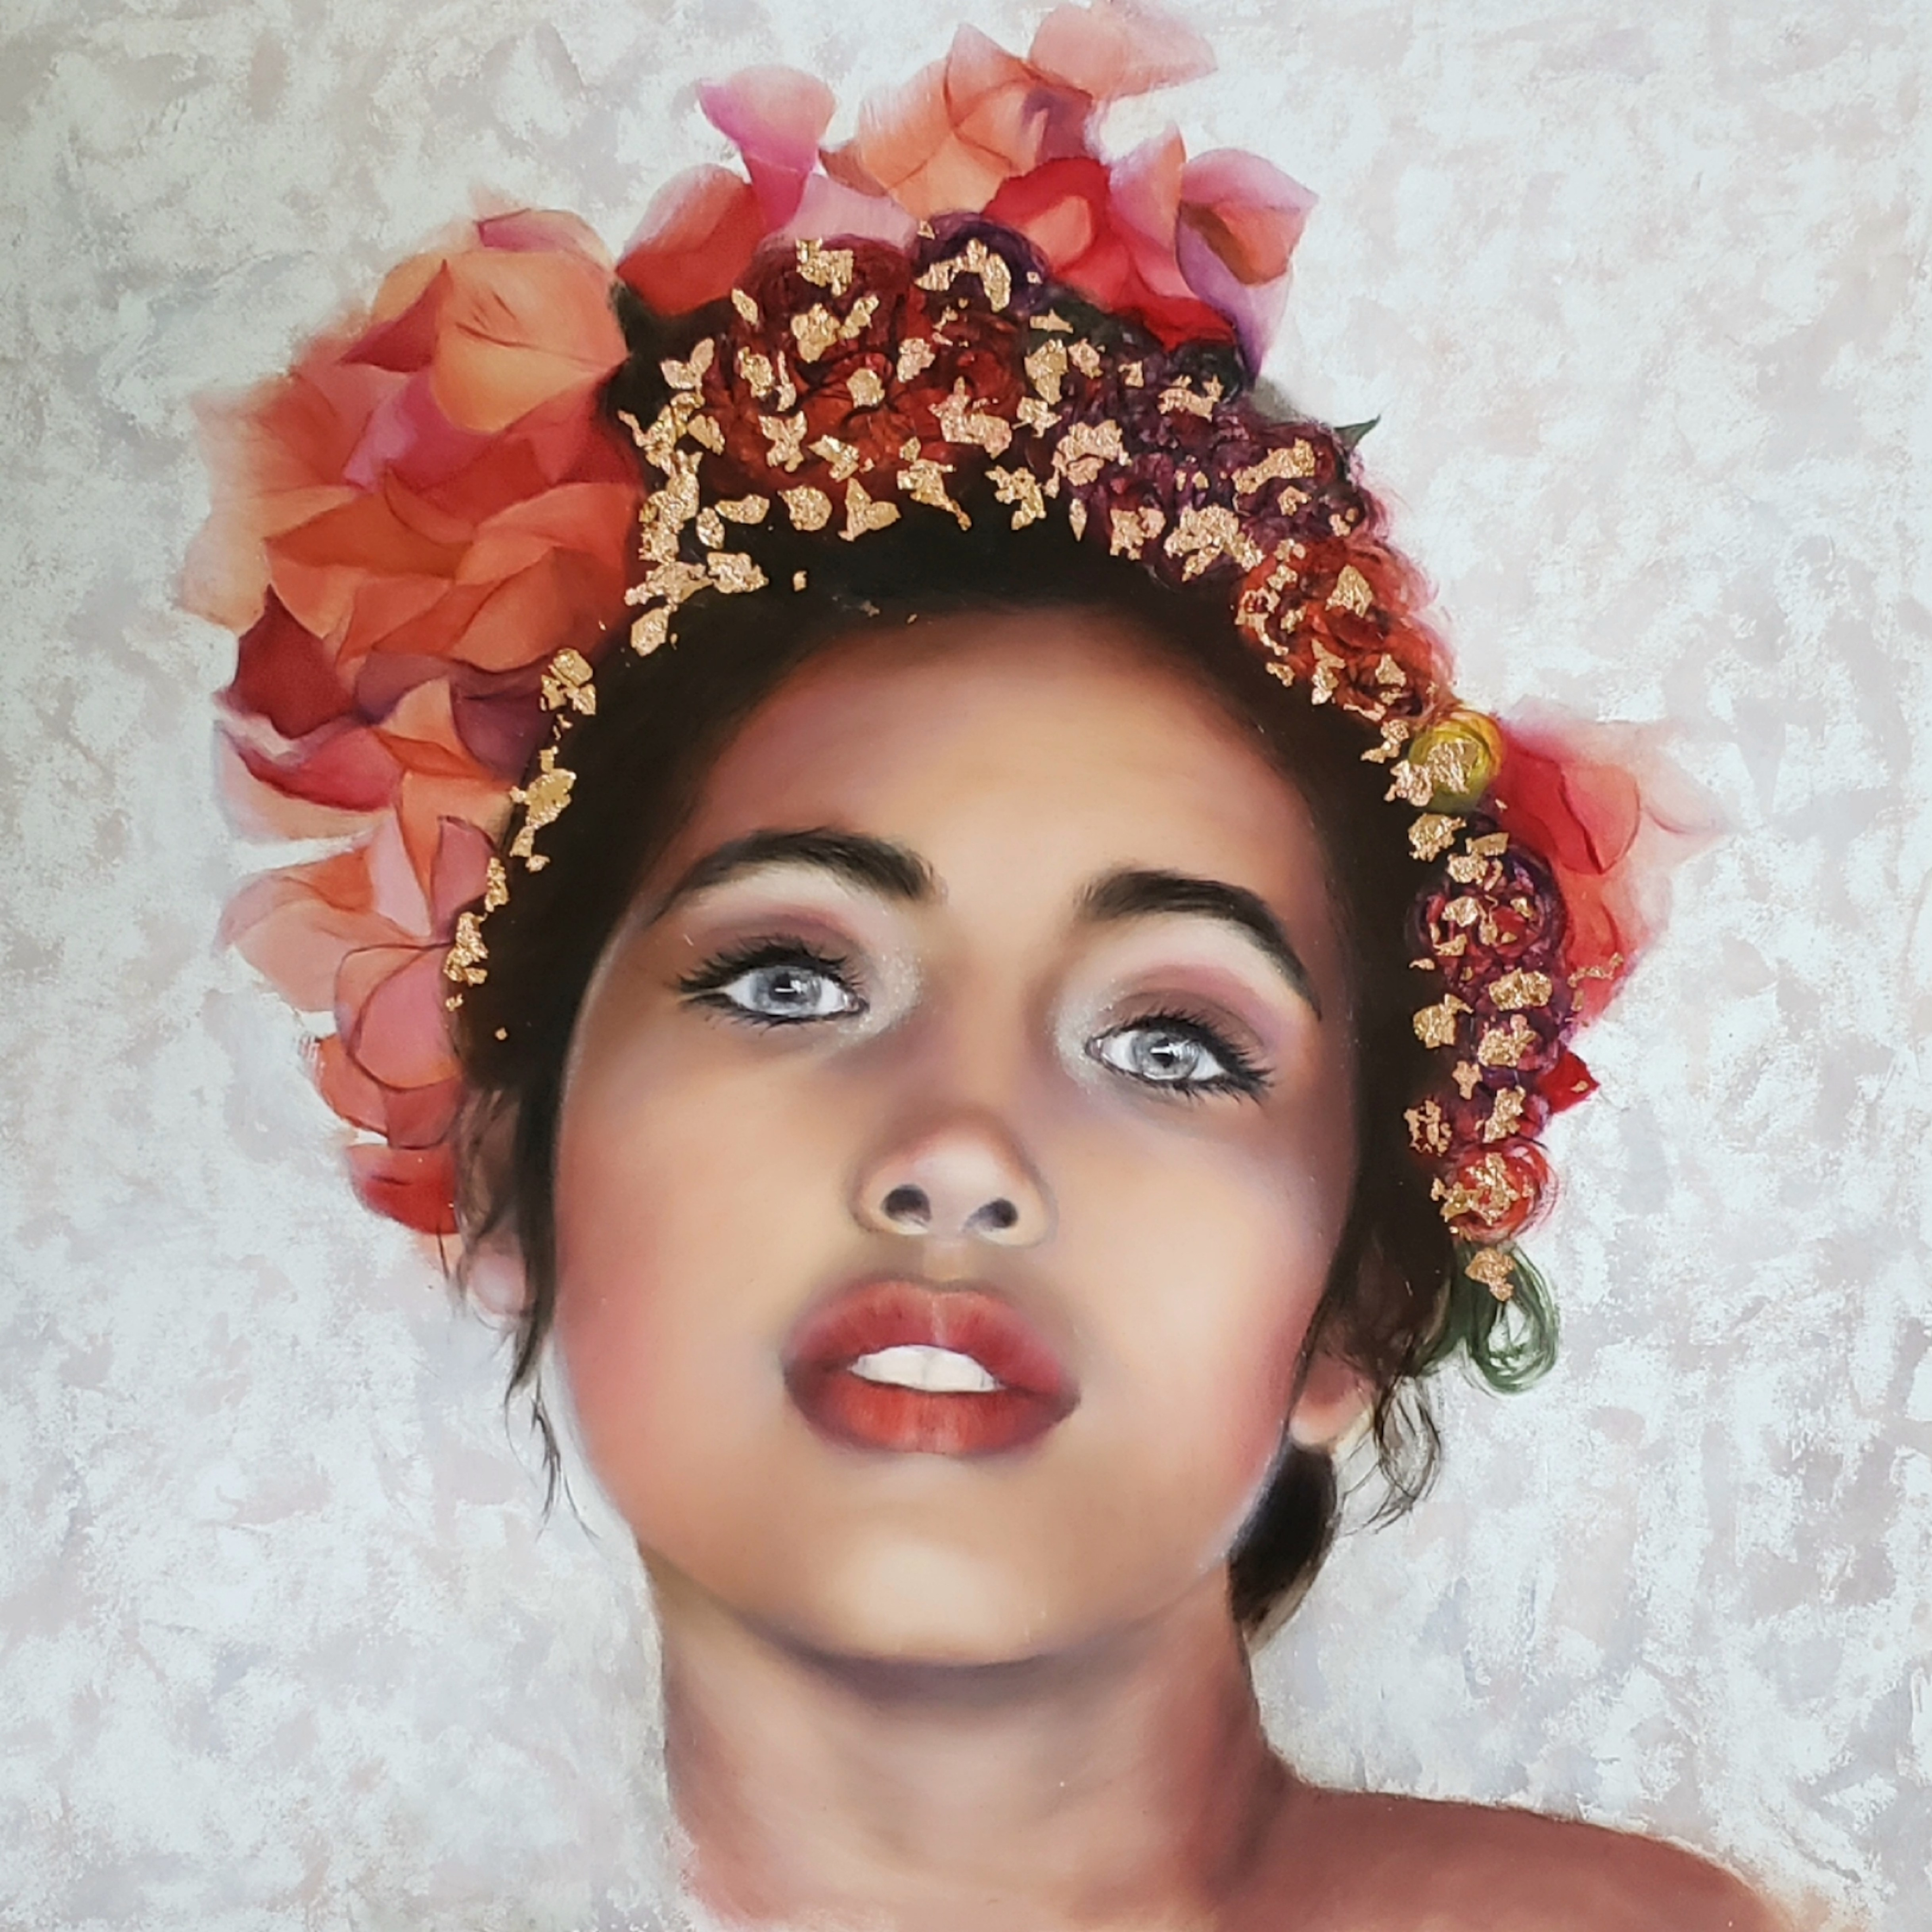 Havana artwork by Nersel zur Muehlen - art listed for sale on Artplode